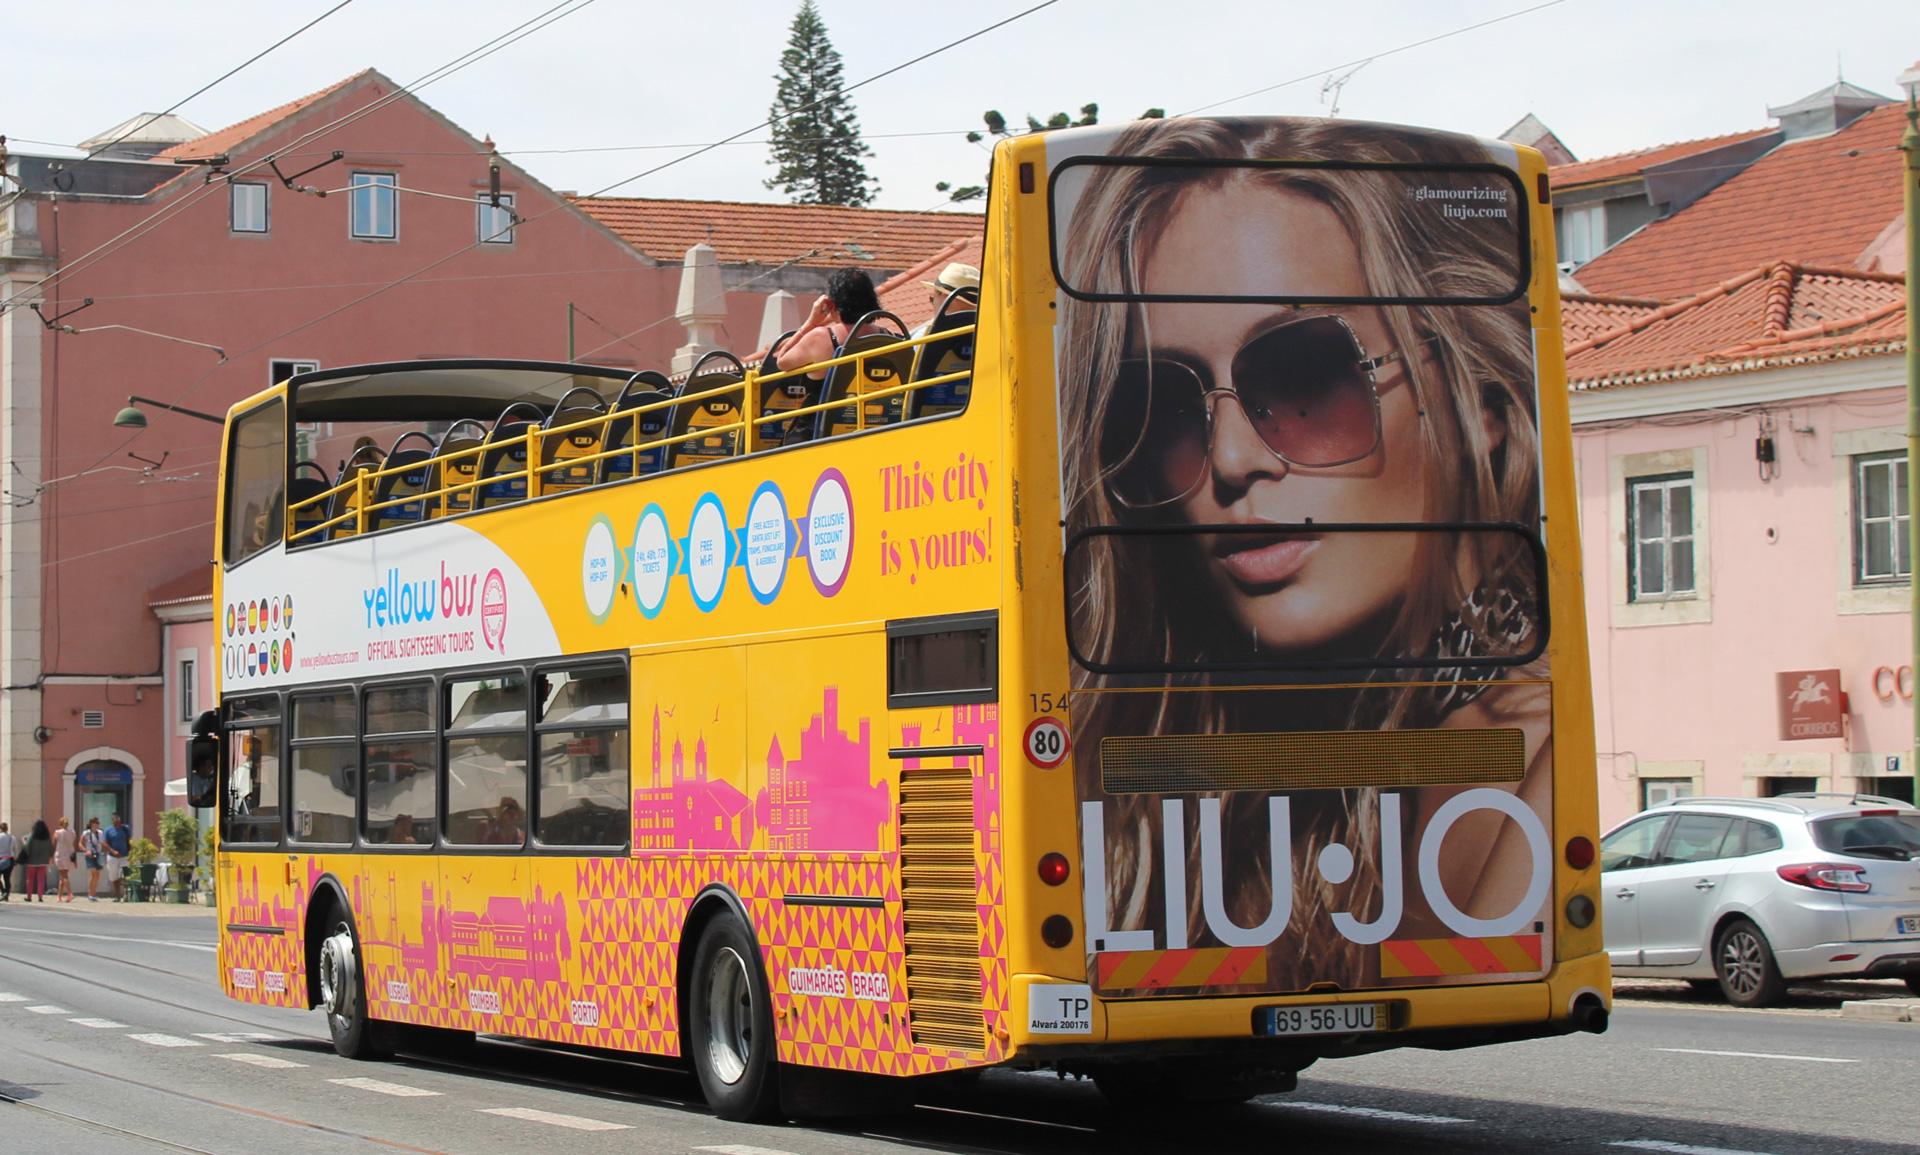 Lisbon Sightseeing bus advertising